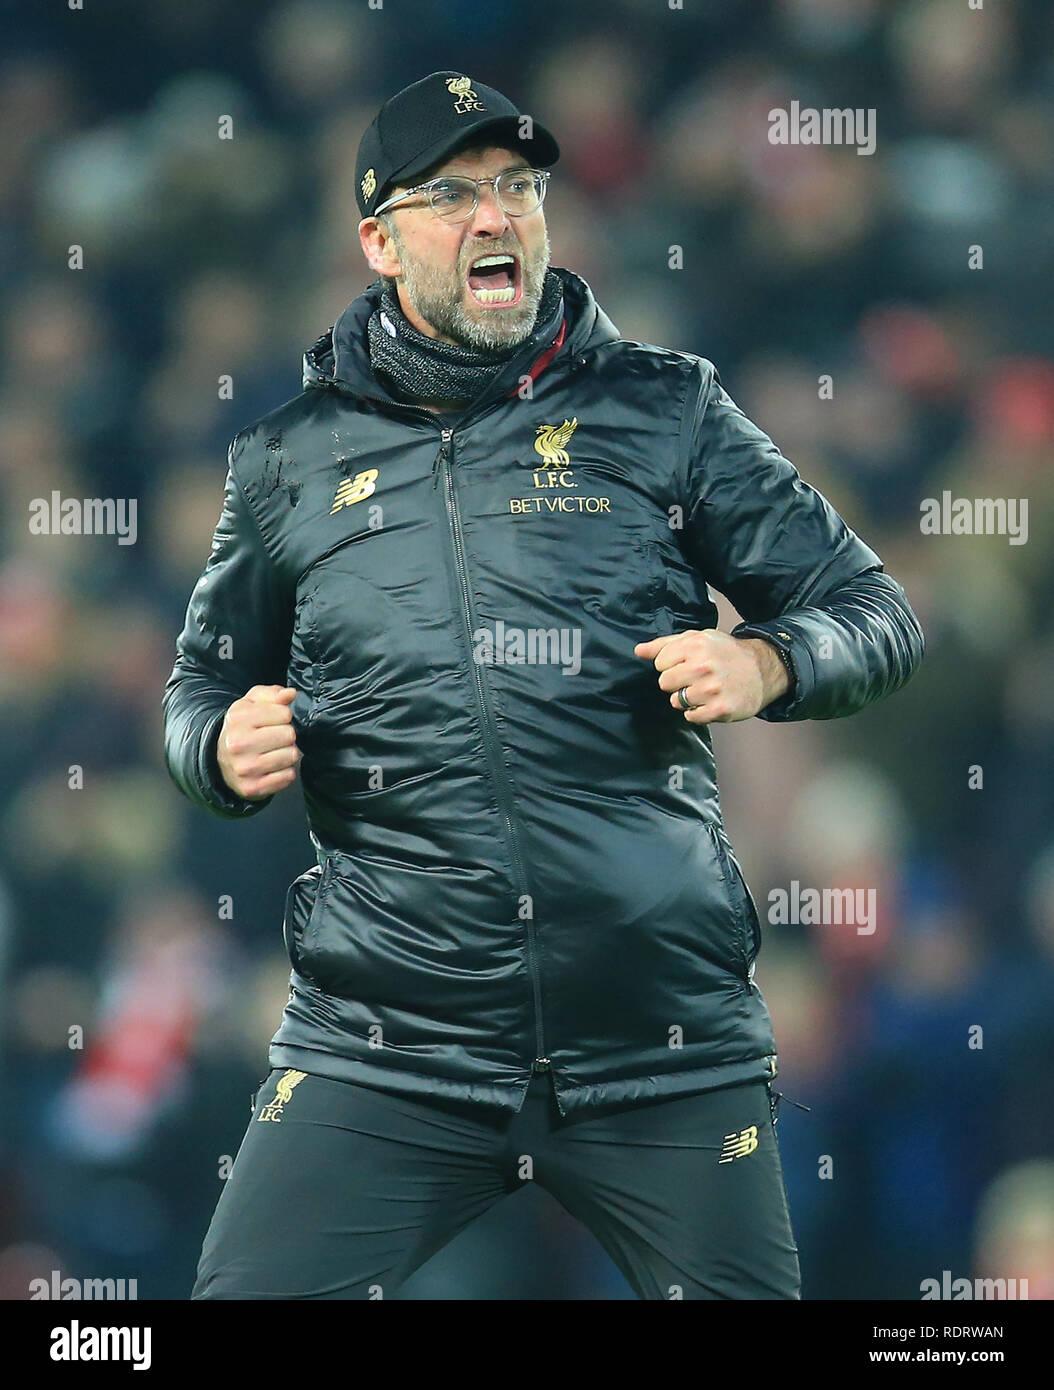 Anfield Liverpool Grossbritannien Jan 2019 19 Epl